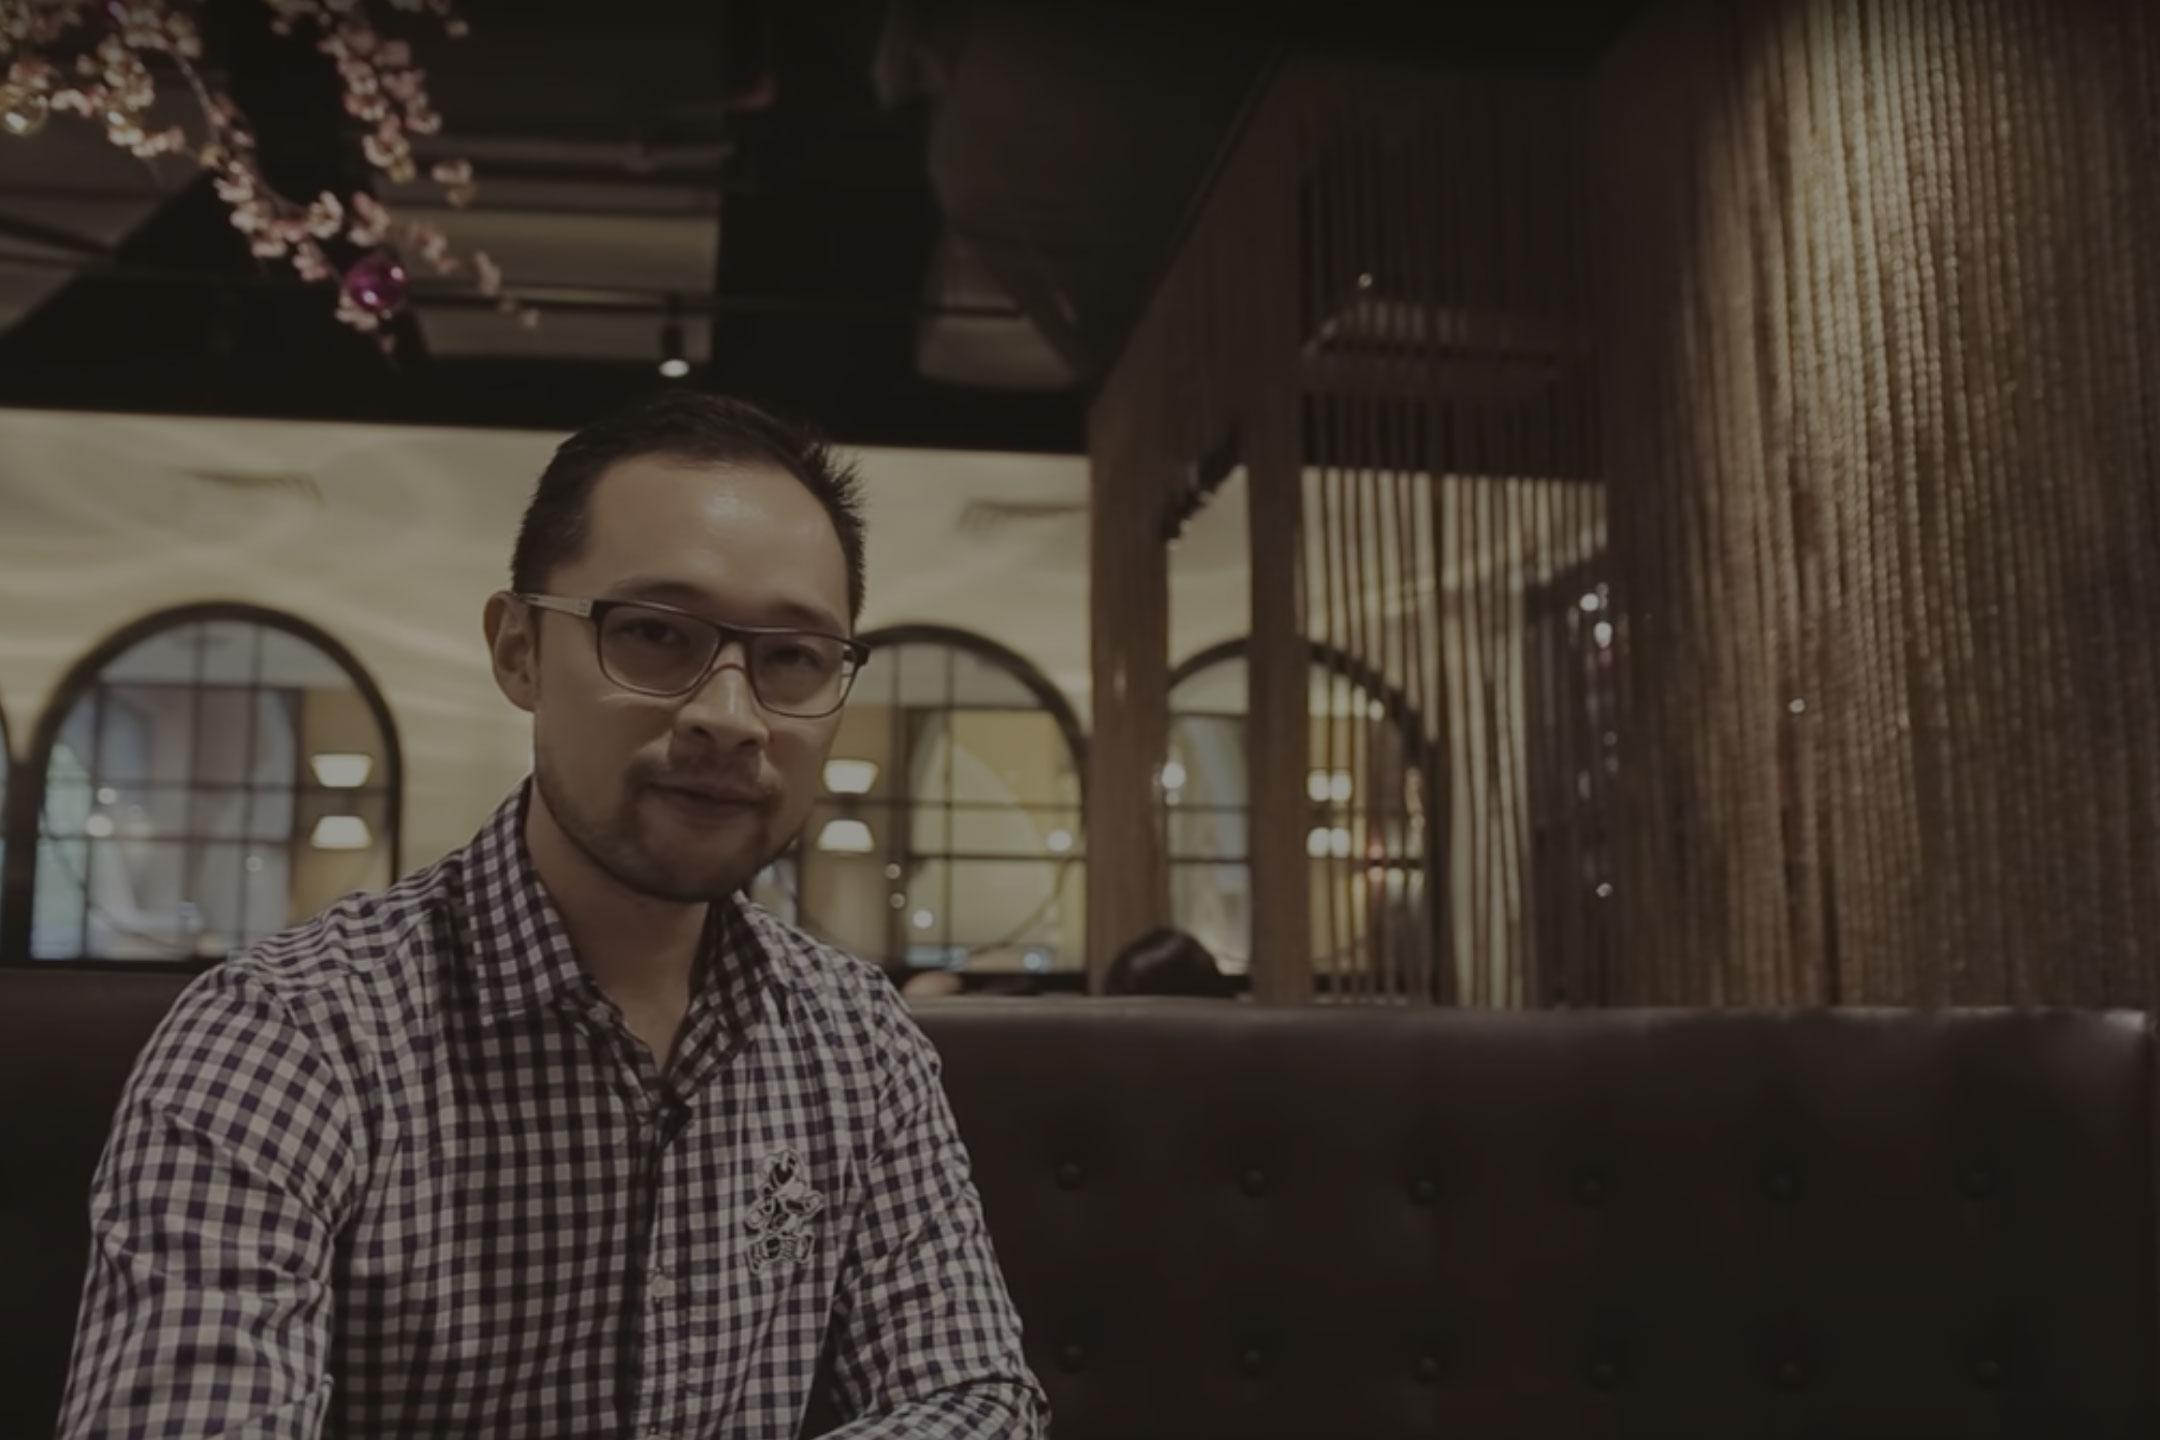 Video testimonial from Hana Dining Sake Bar to Twentythree